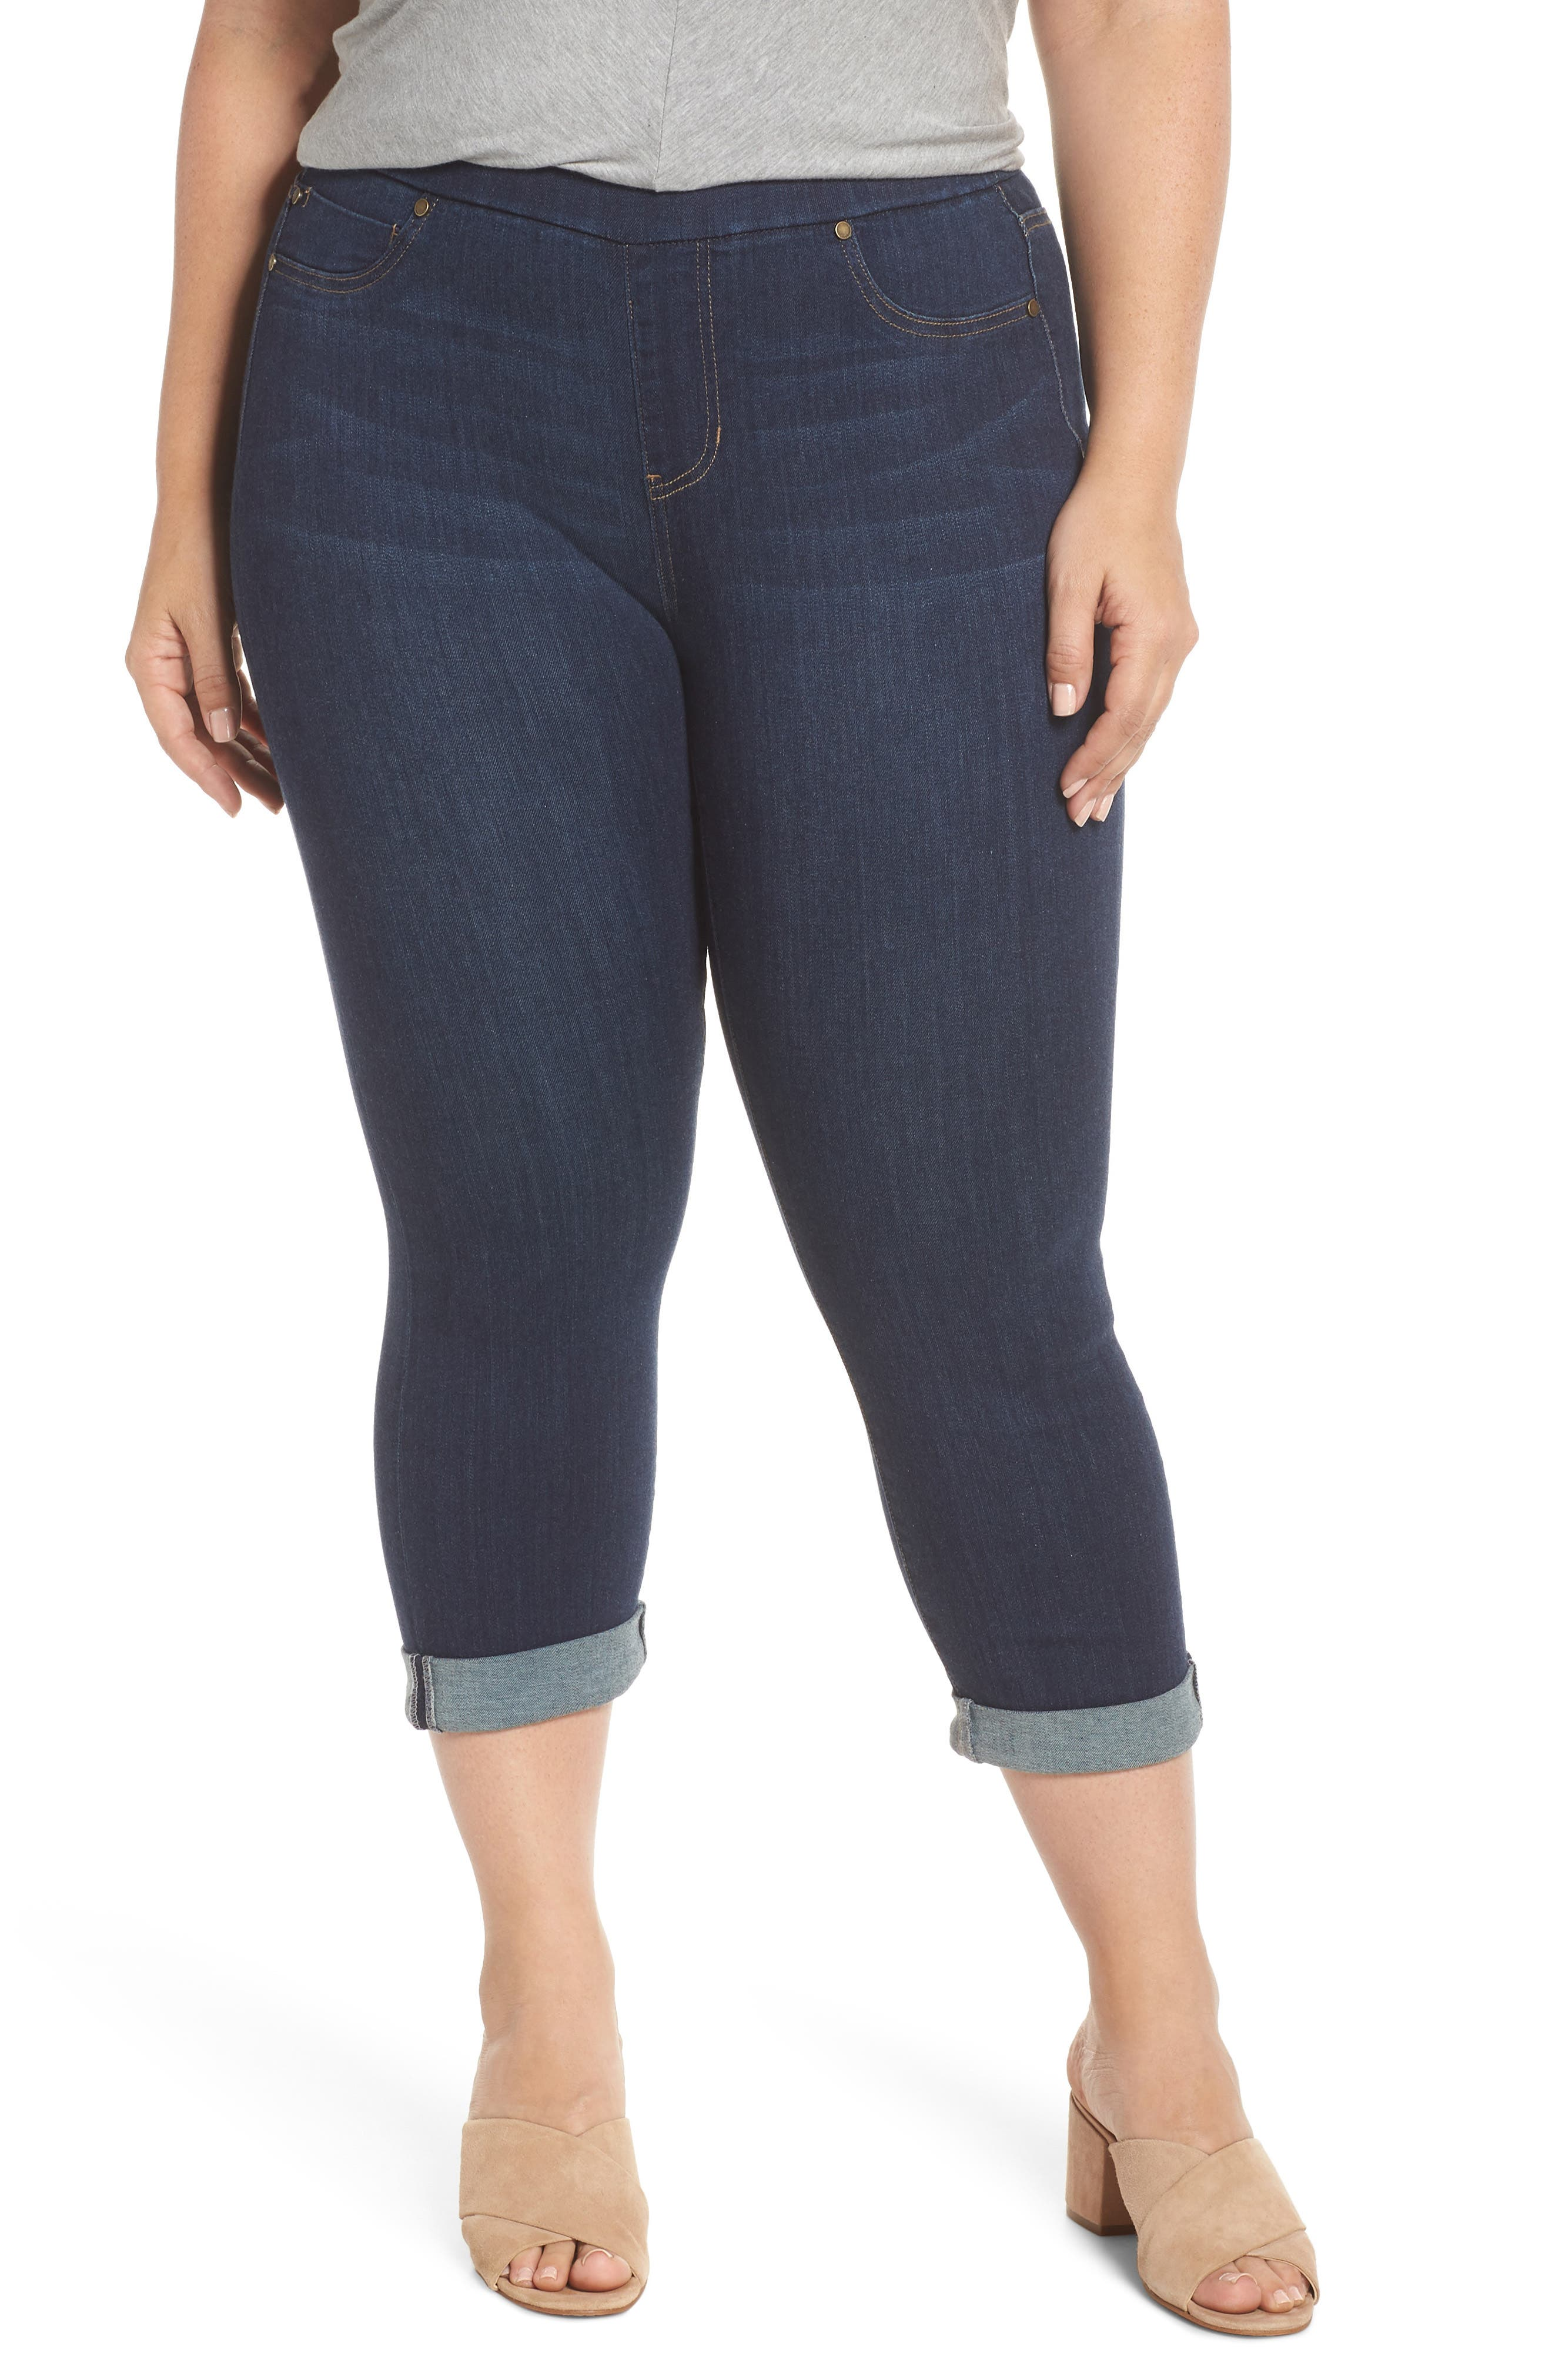 Plus Size Liverpool Sienna Pull-On Denim Capri Pants, Blue